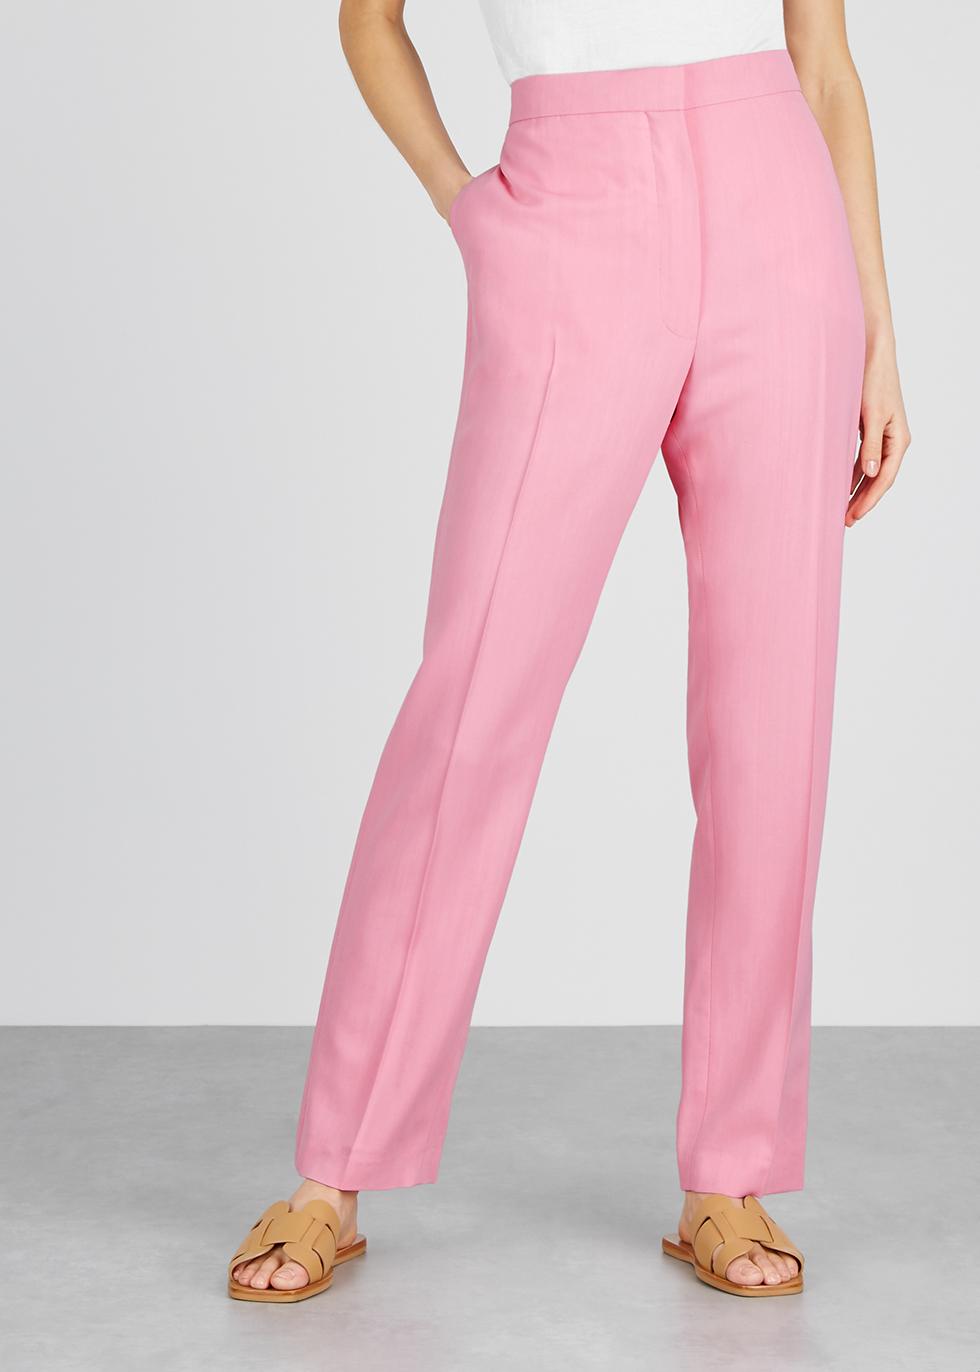 Pink straight-leg twill trousers - Loewe